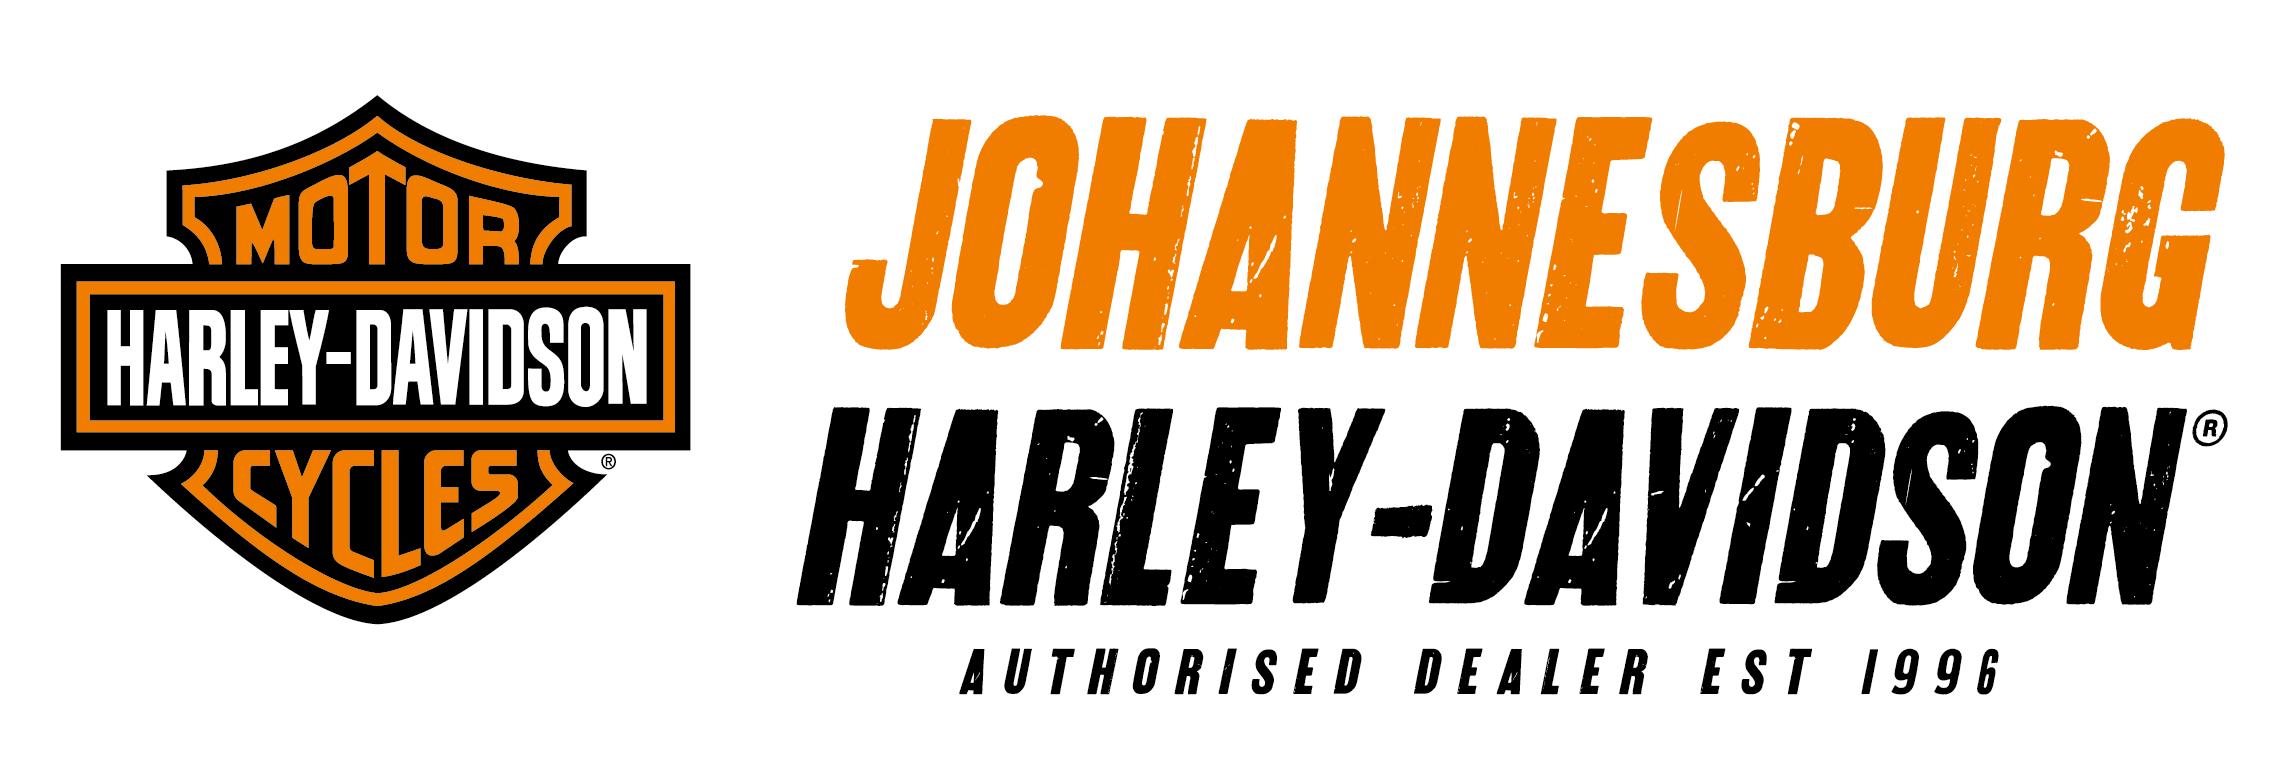 Johannesburg Harley-Davidson<sup>®</sup>